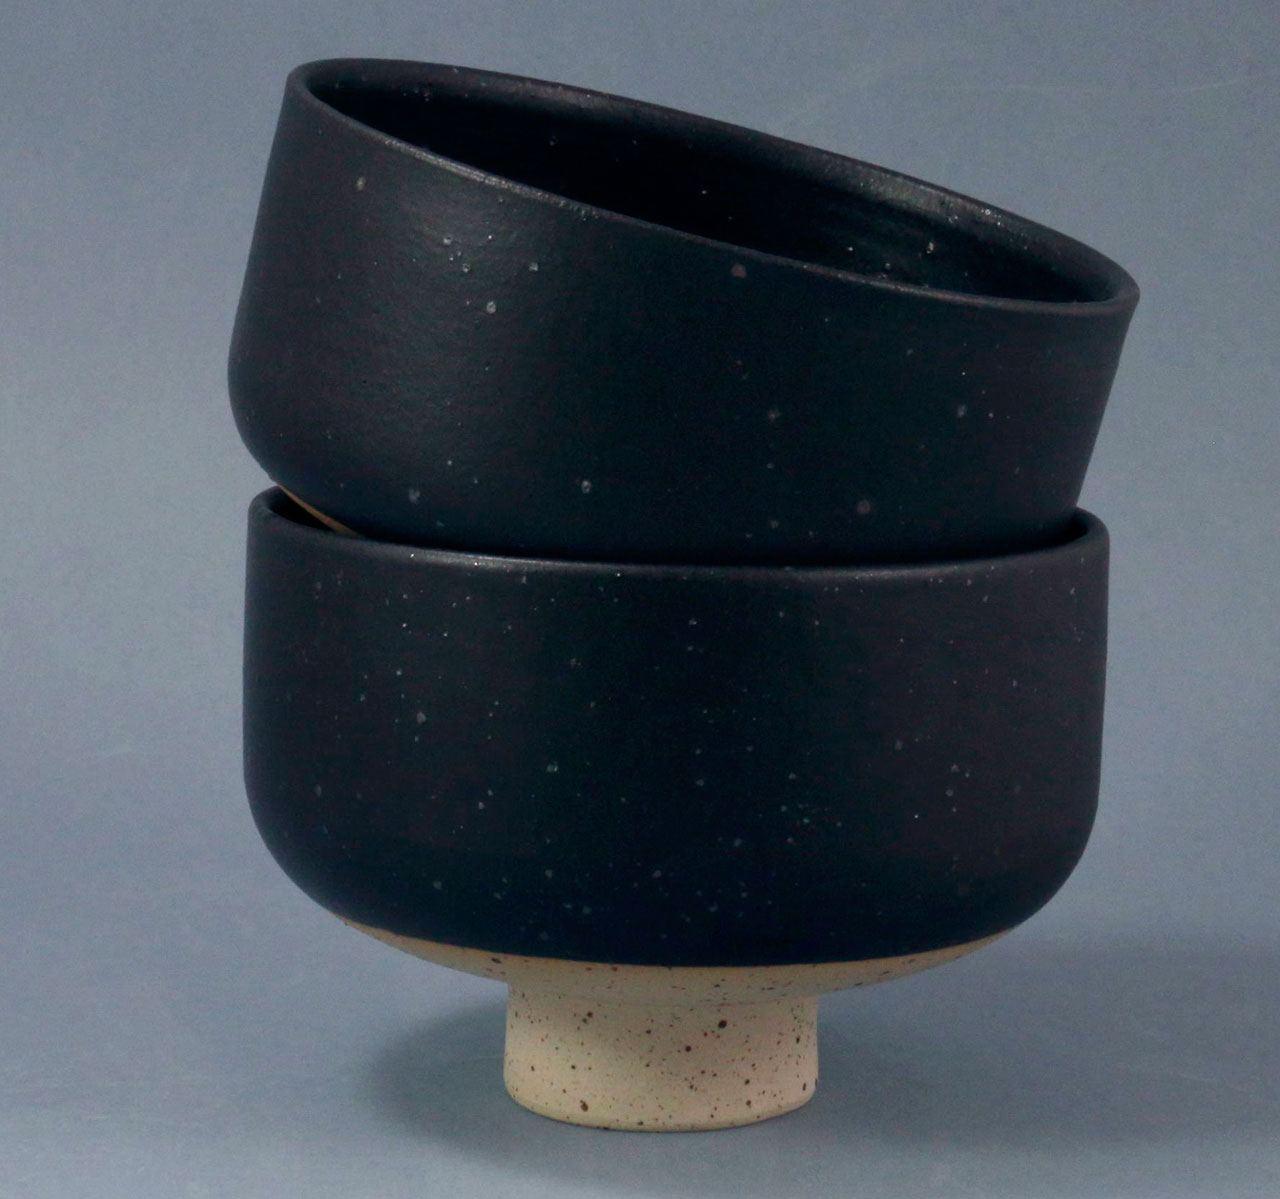 Winter Bowl Black Sheep - Matte